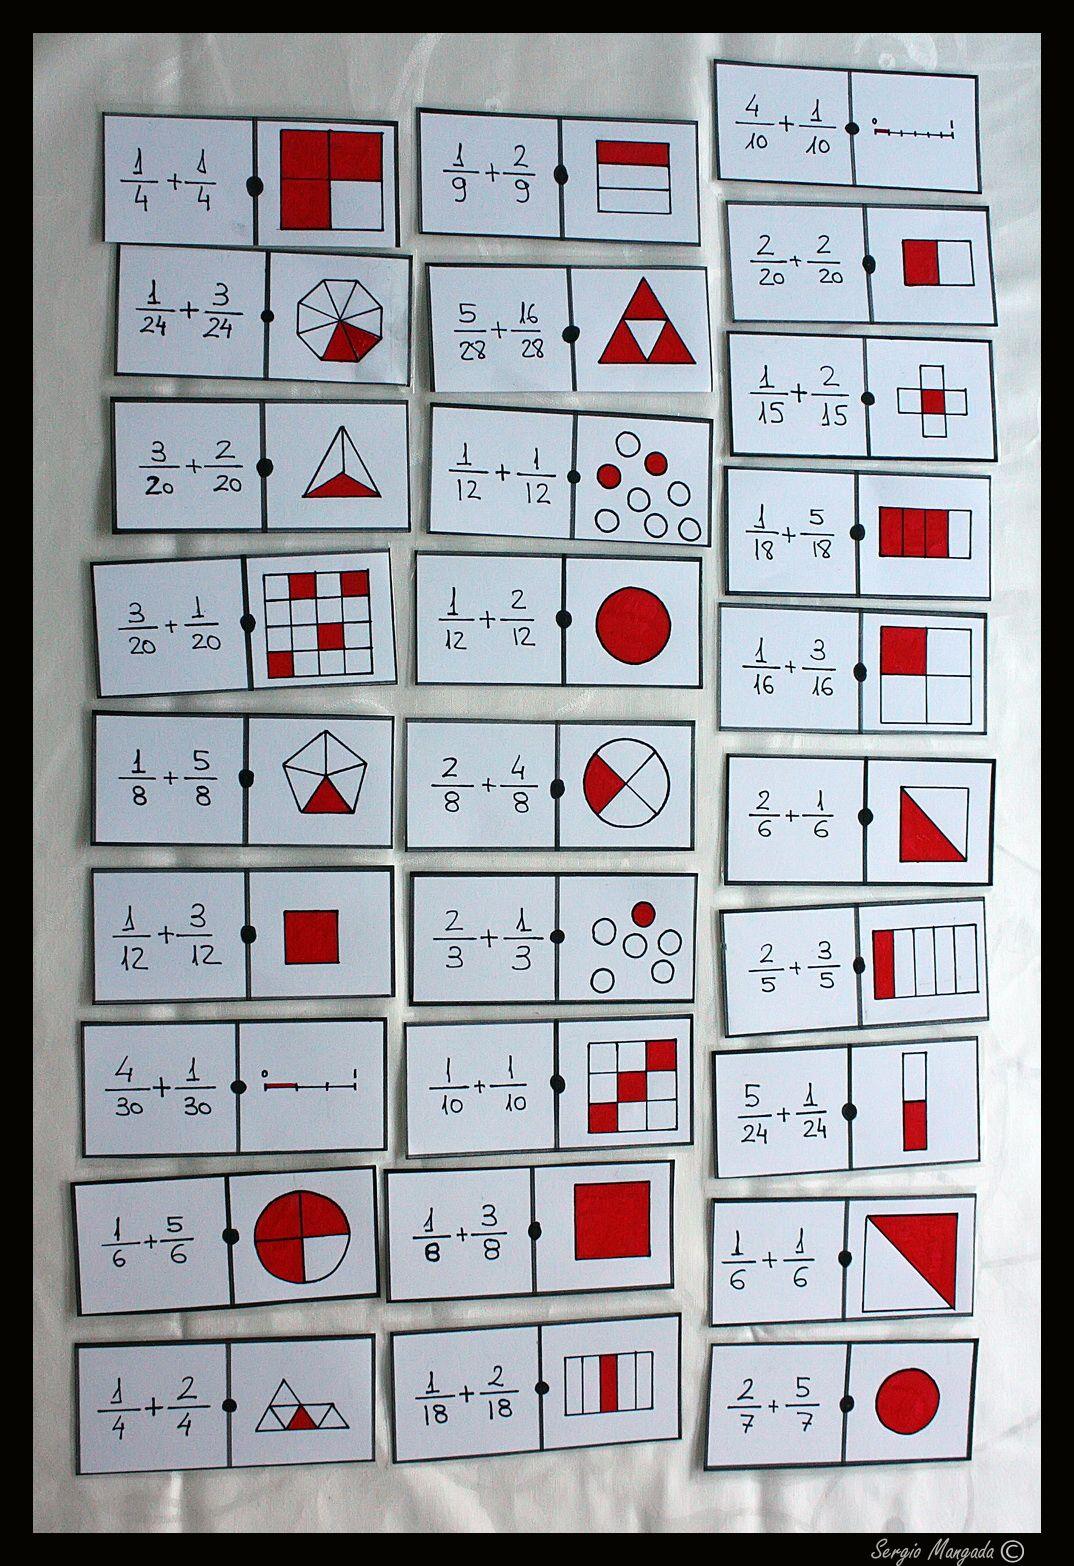 Domino Matematico Completo De Suma De Fracciones